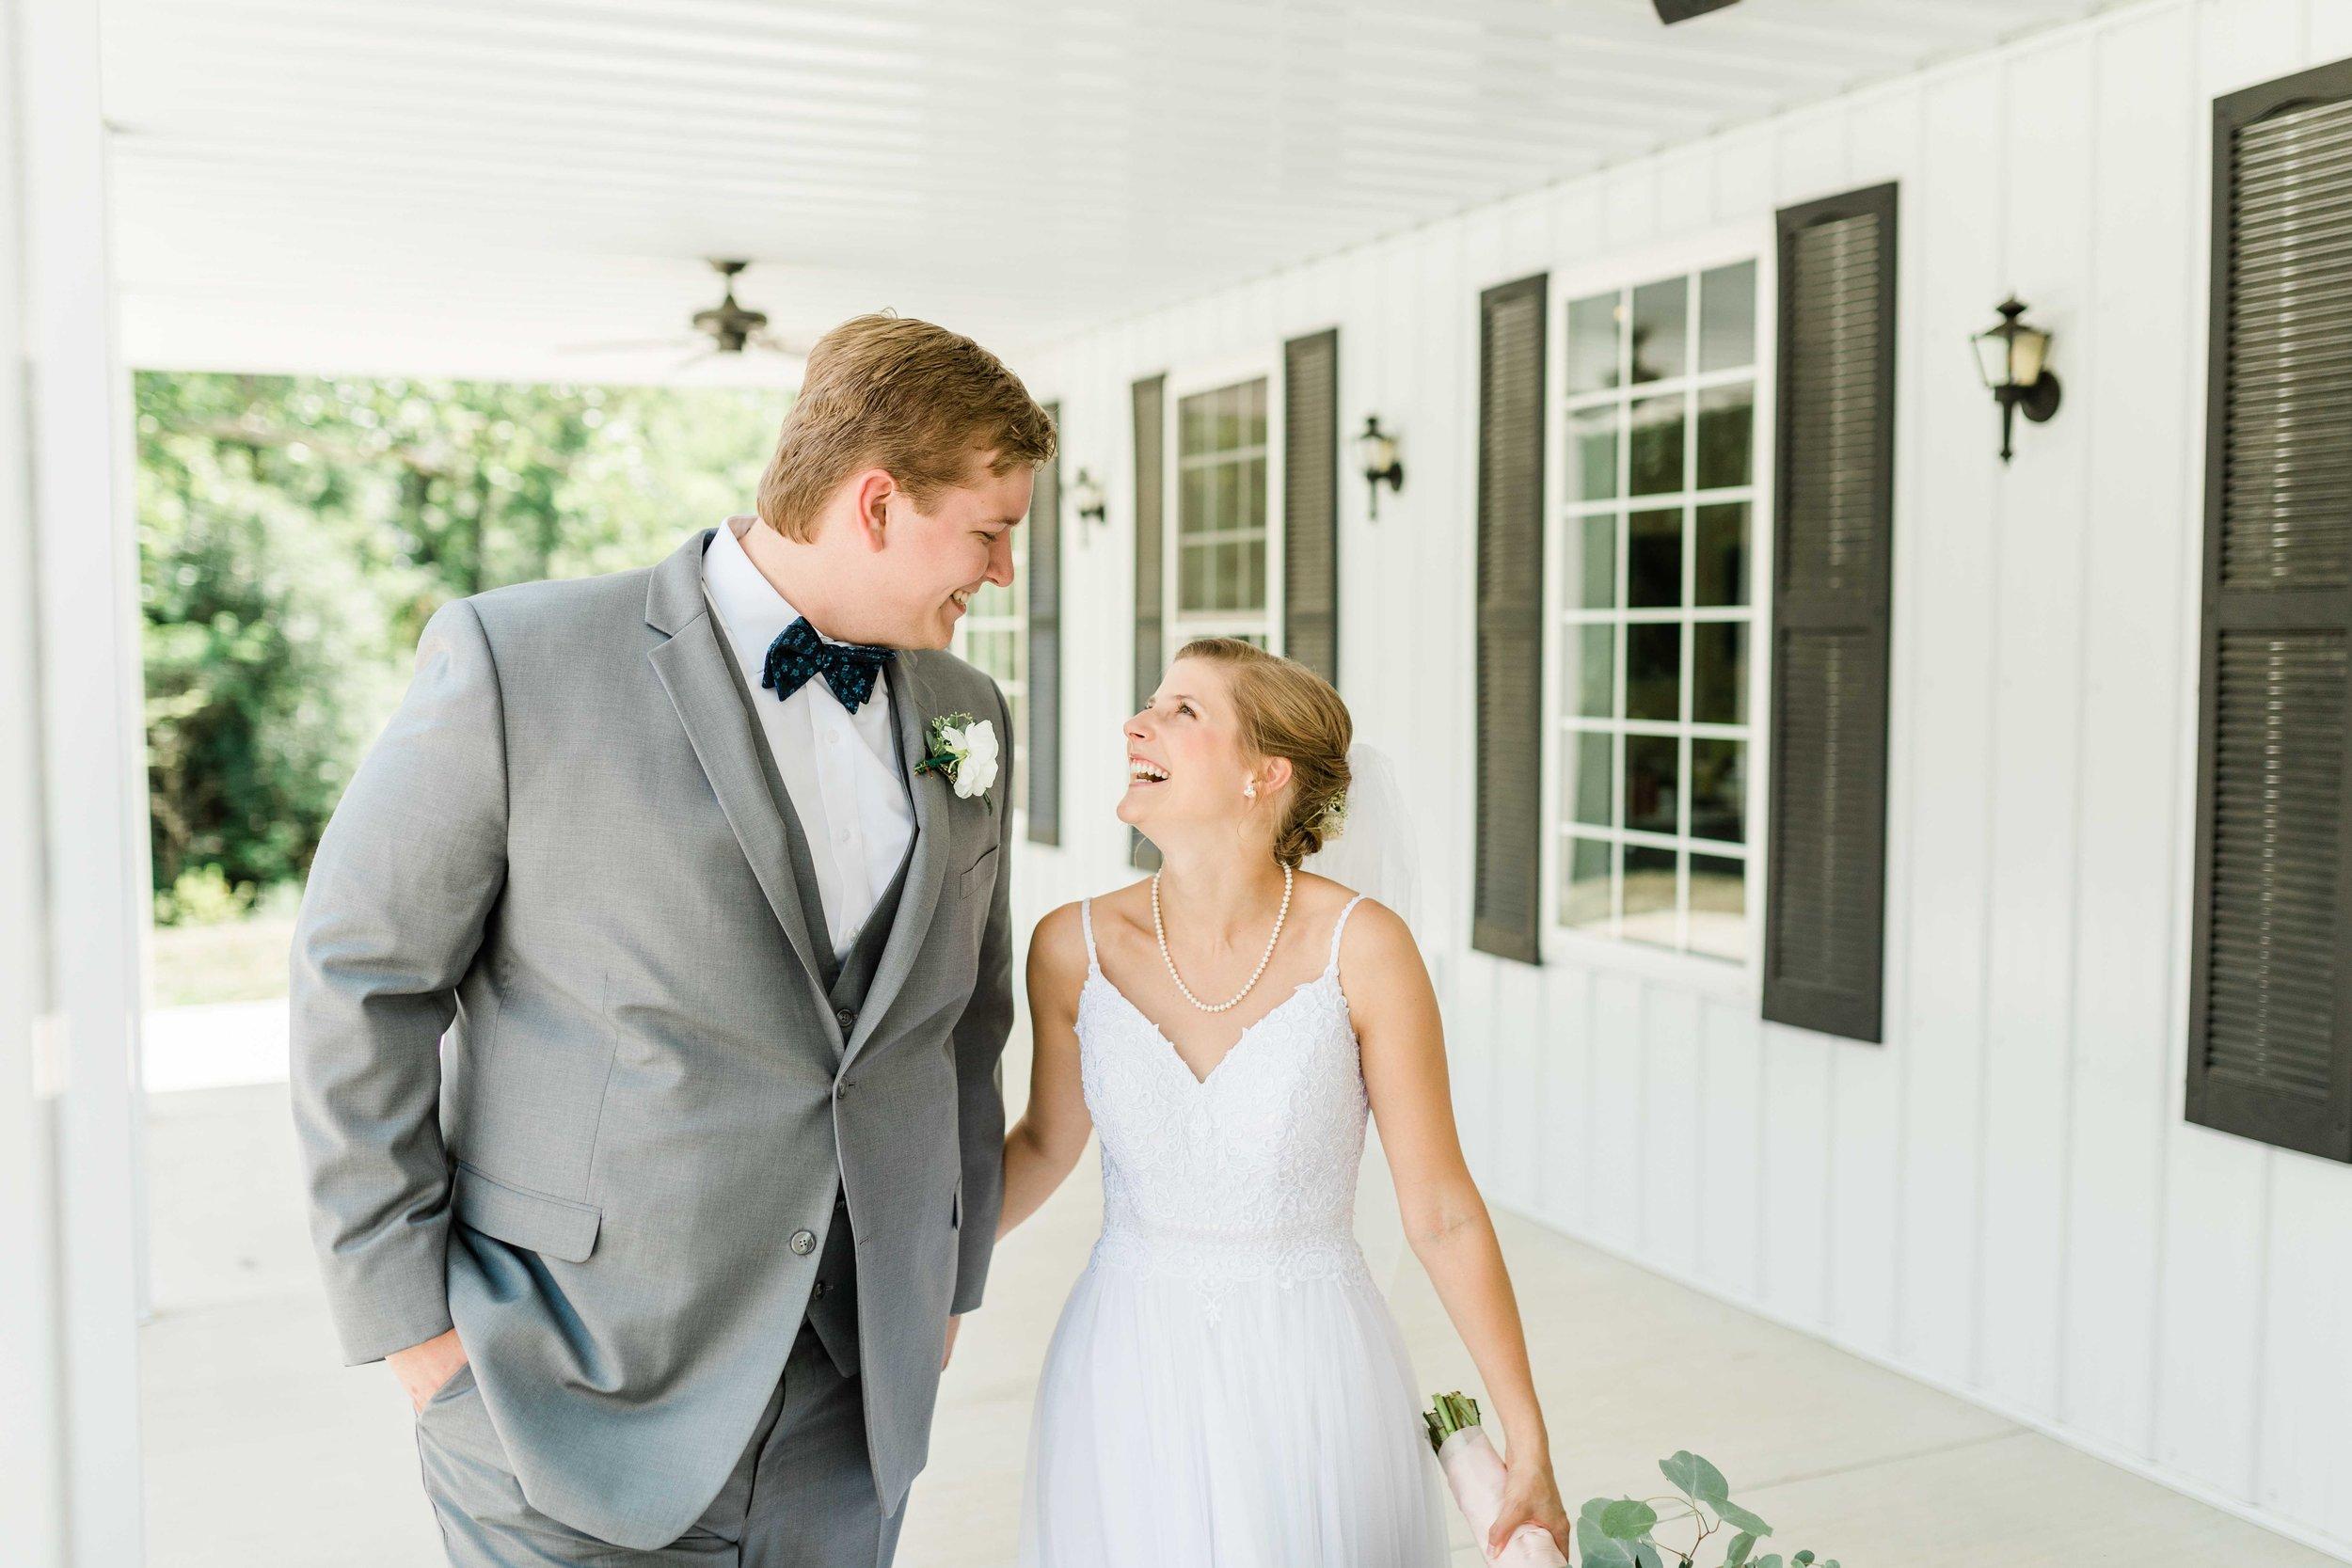 rosewood manor miamisburg ohio wedding-2.jpg